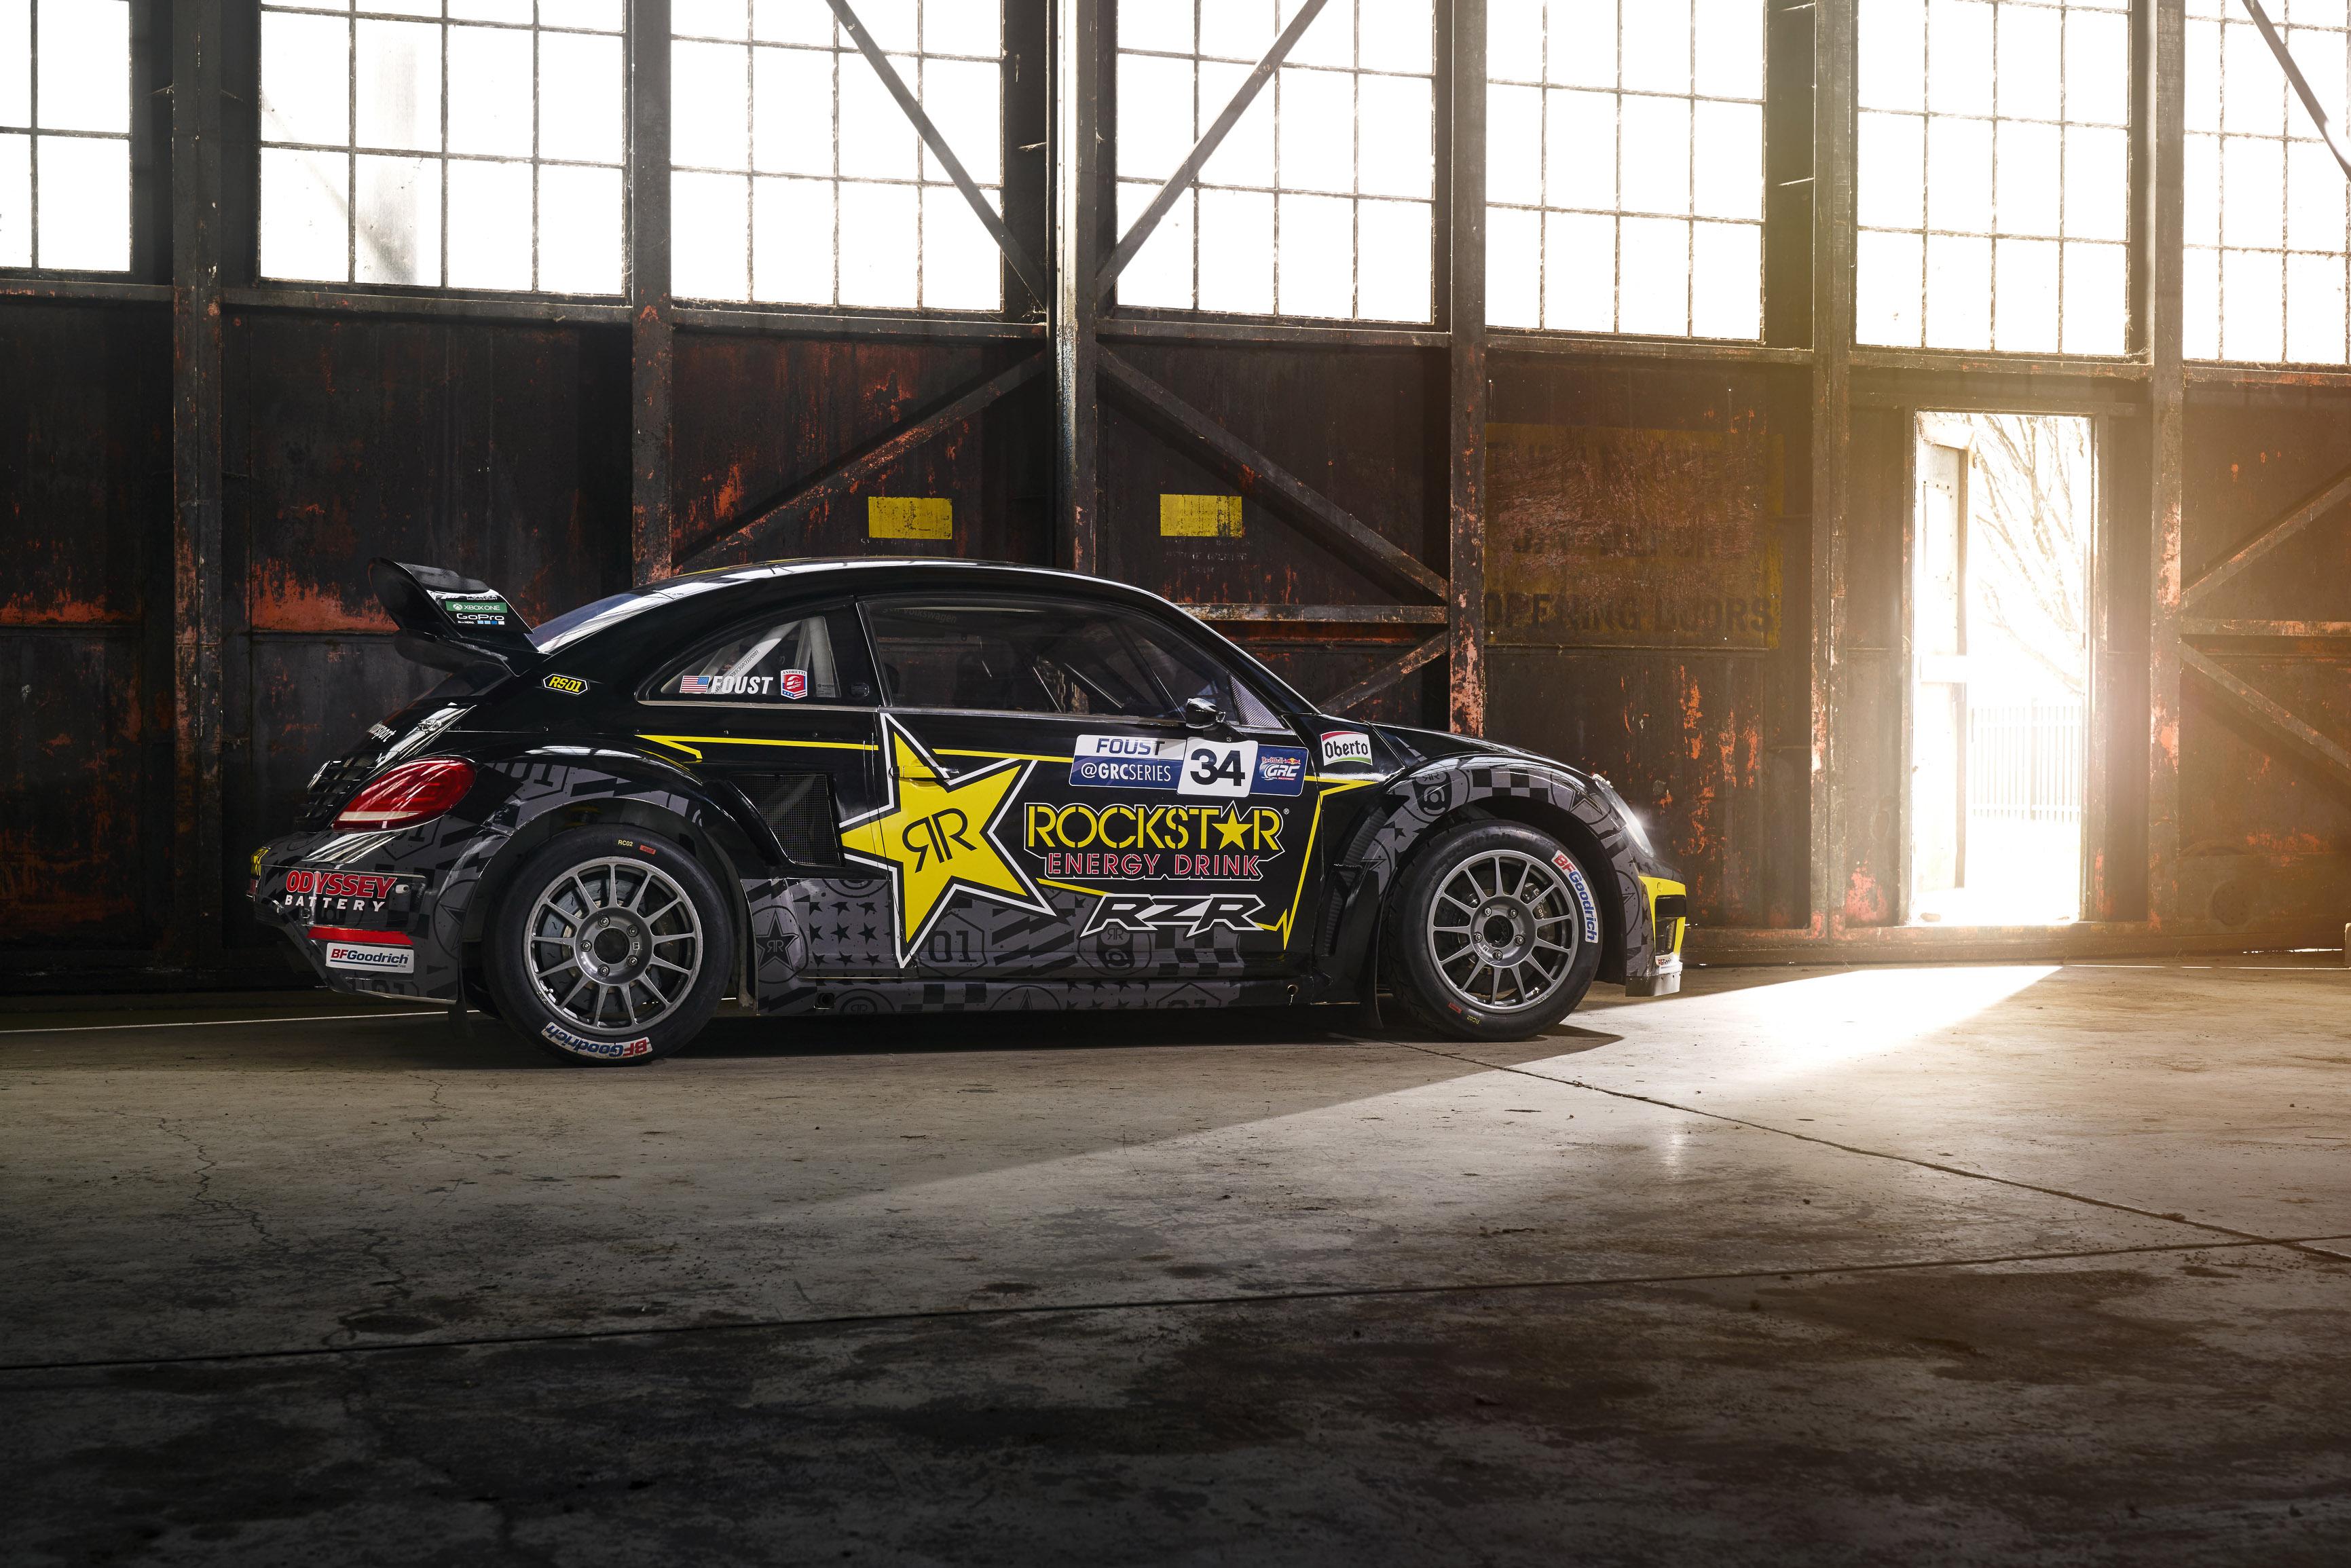 Tanner Foust Vw >> Tanner Foust To Return To Vw Beetle For 2019 Rallycross